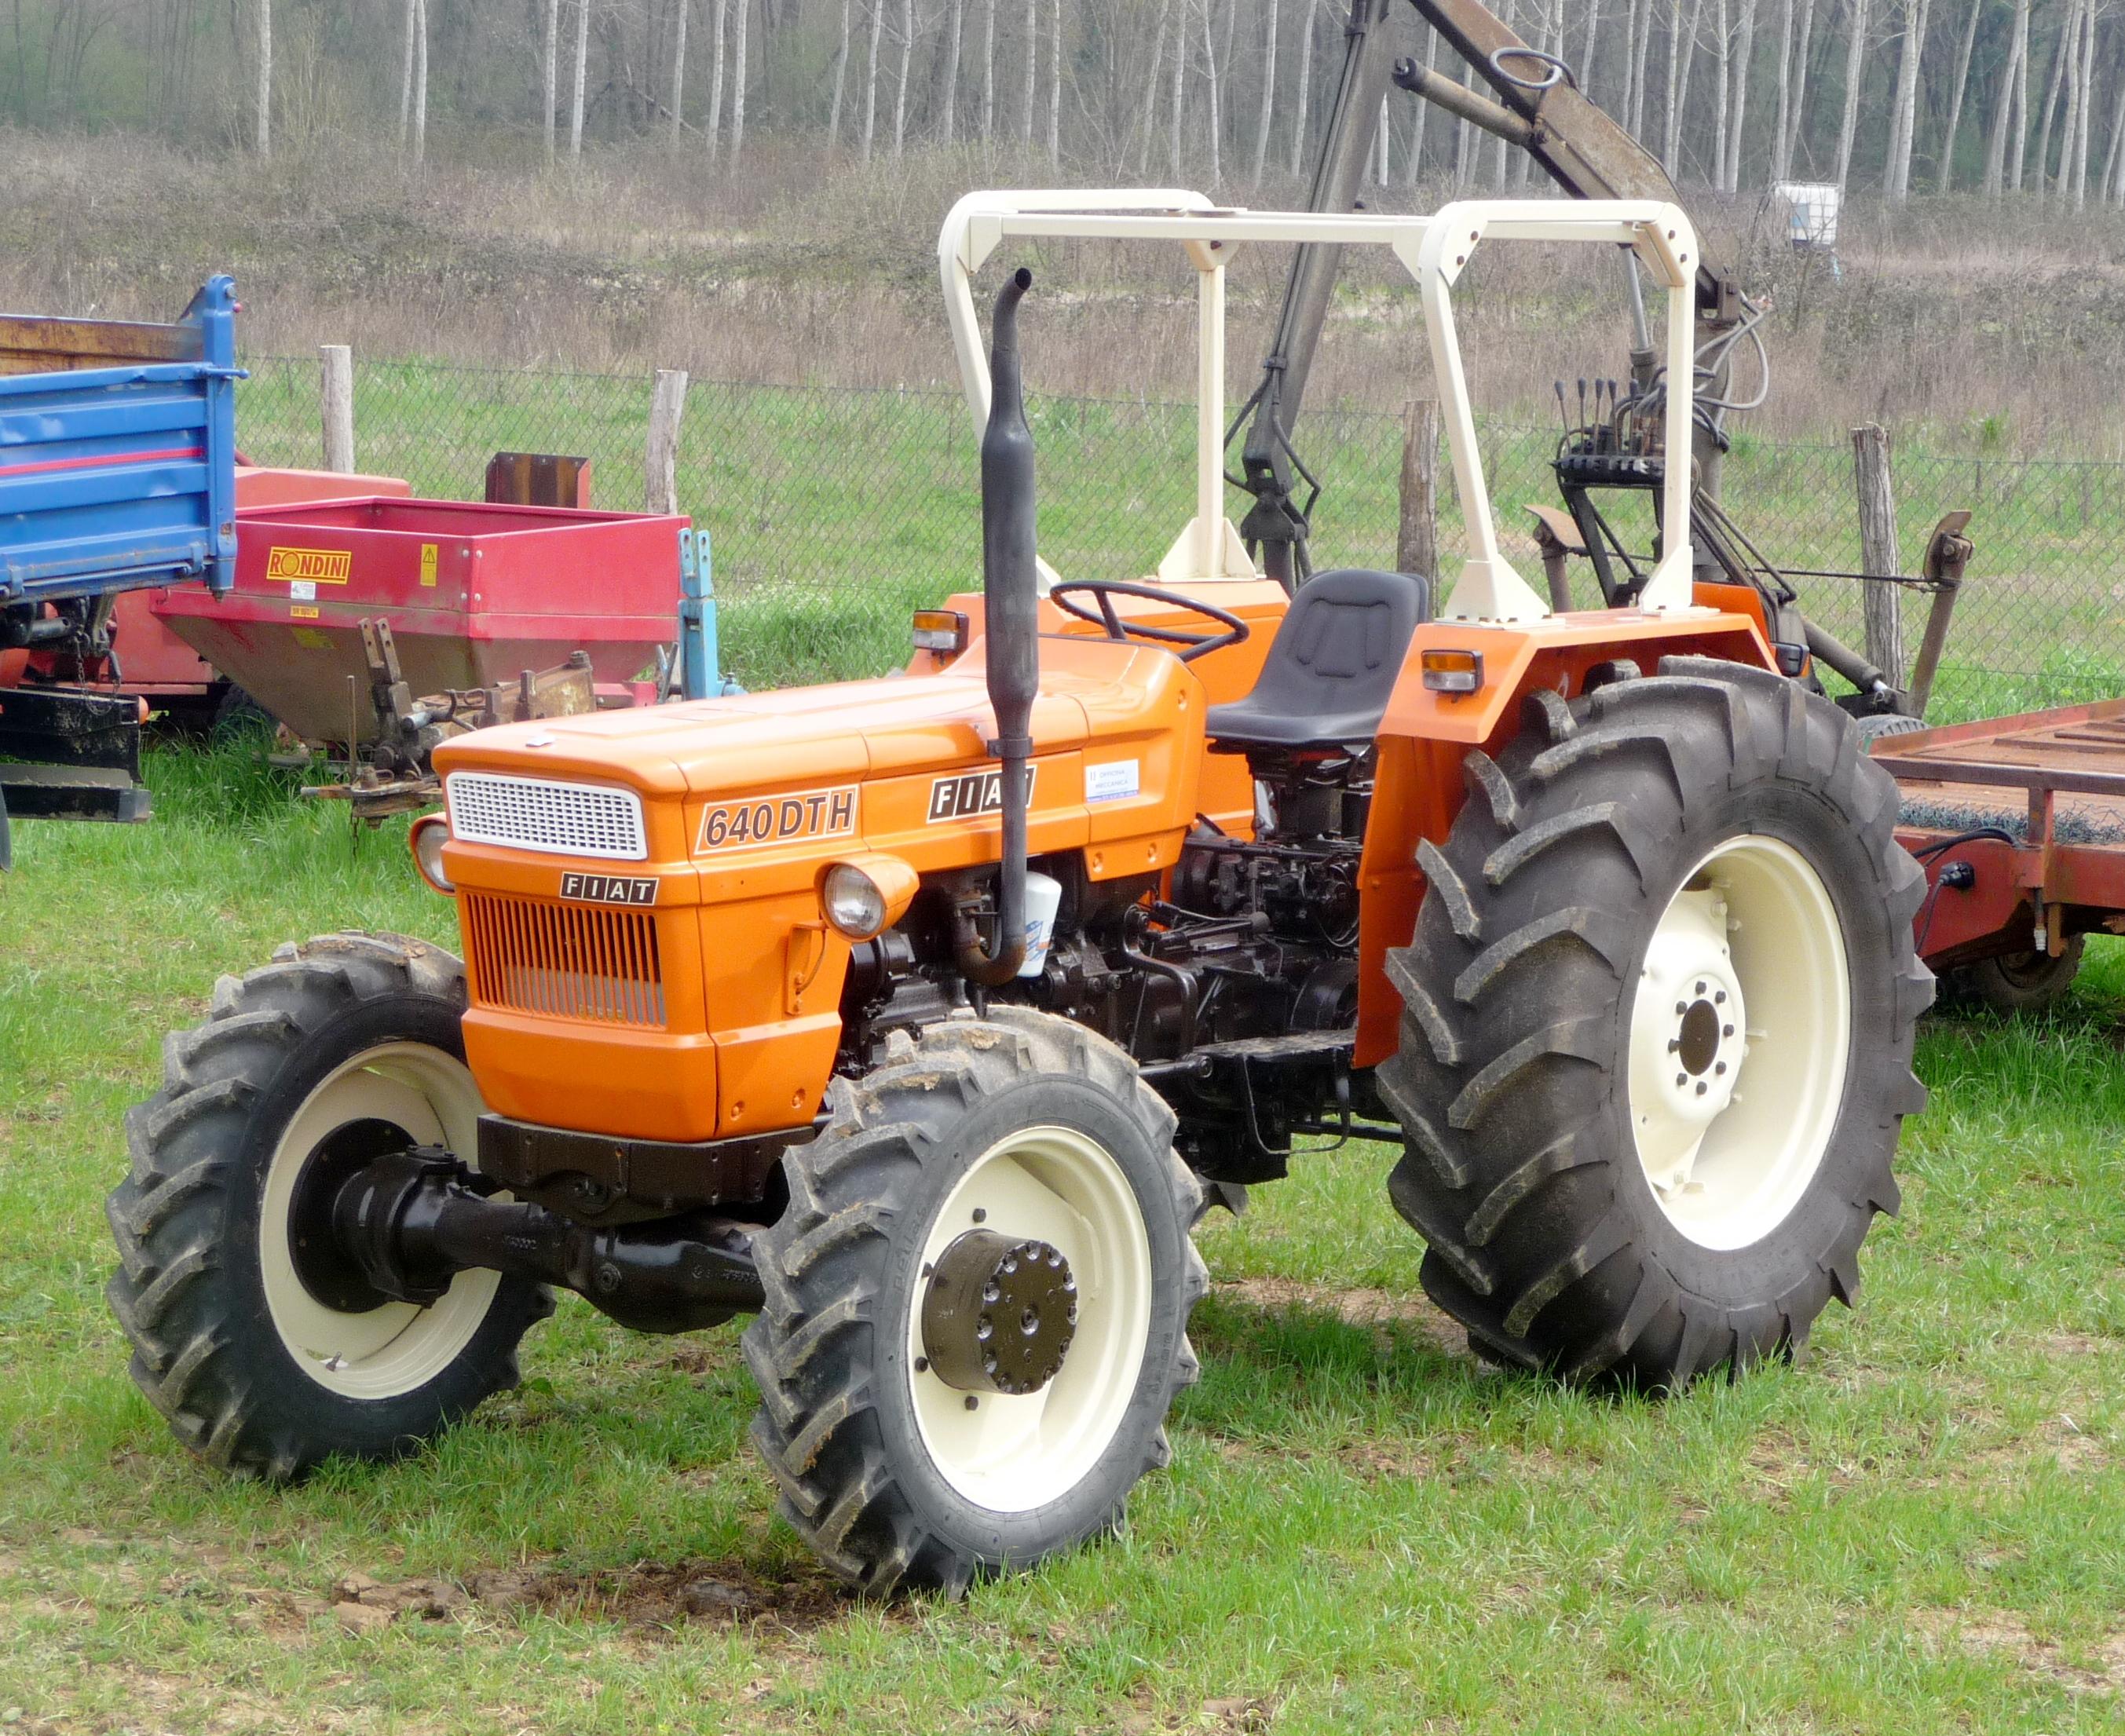 File Fiat 640 Dth Tractor Jpg